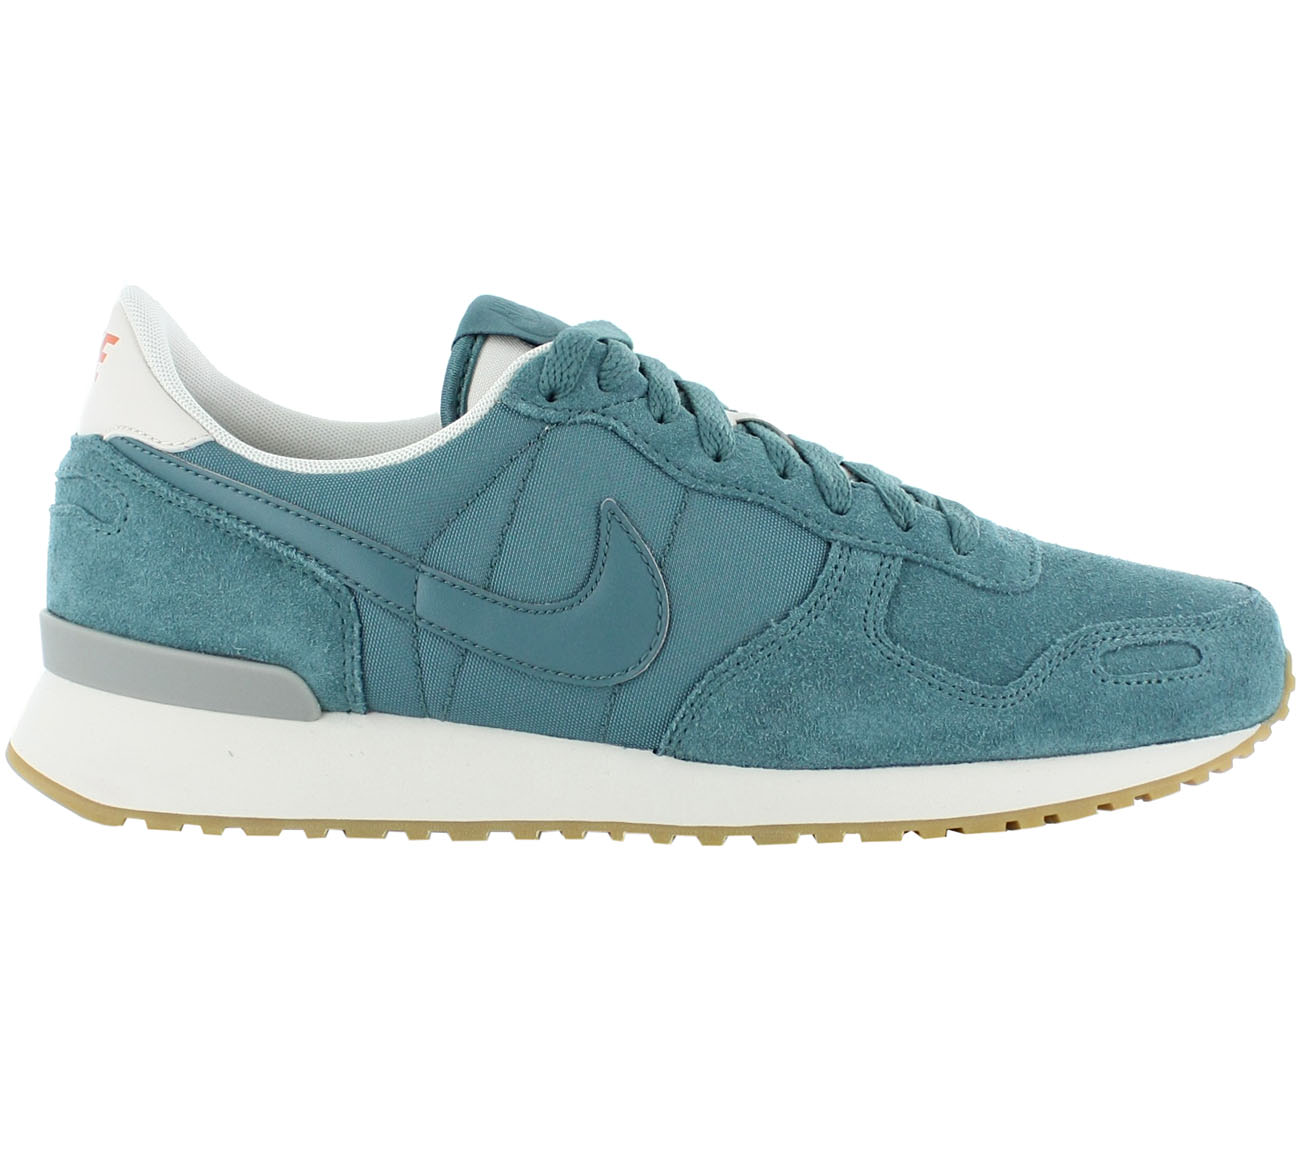 Nike Air Sneaker Vortex Leather Schuhe Herren Sneaker Air Leder Turnschuhe Freizeit LTR NEU fd649f